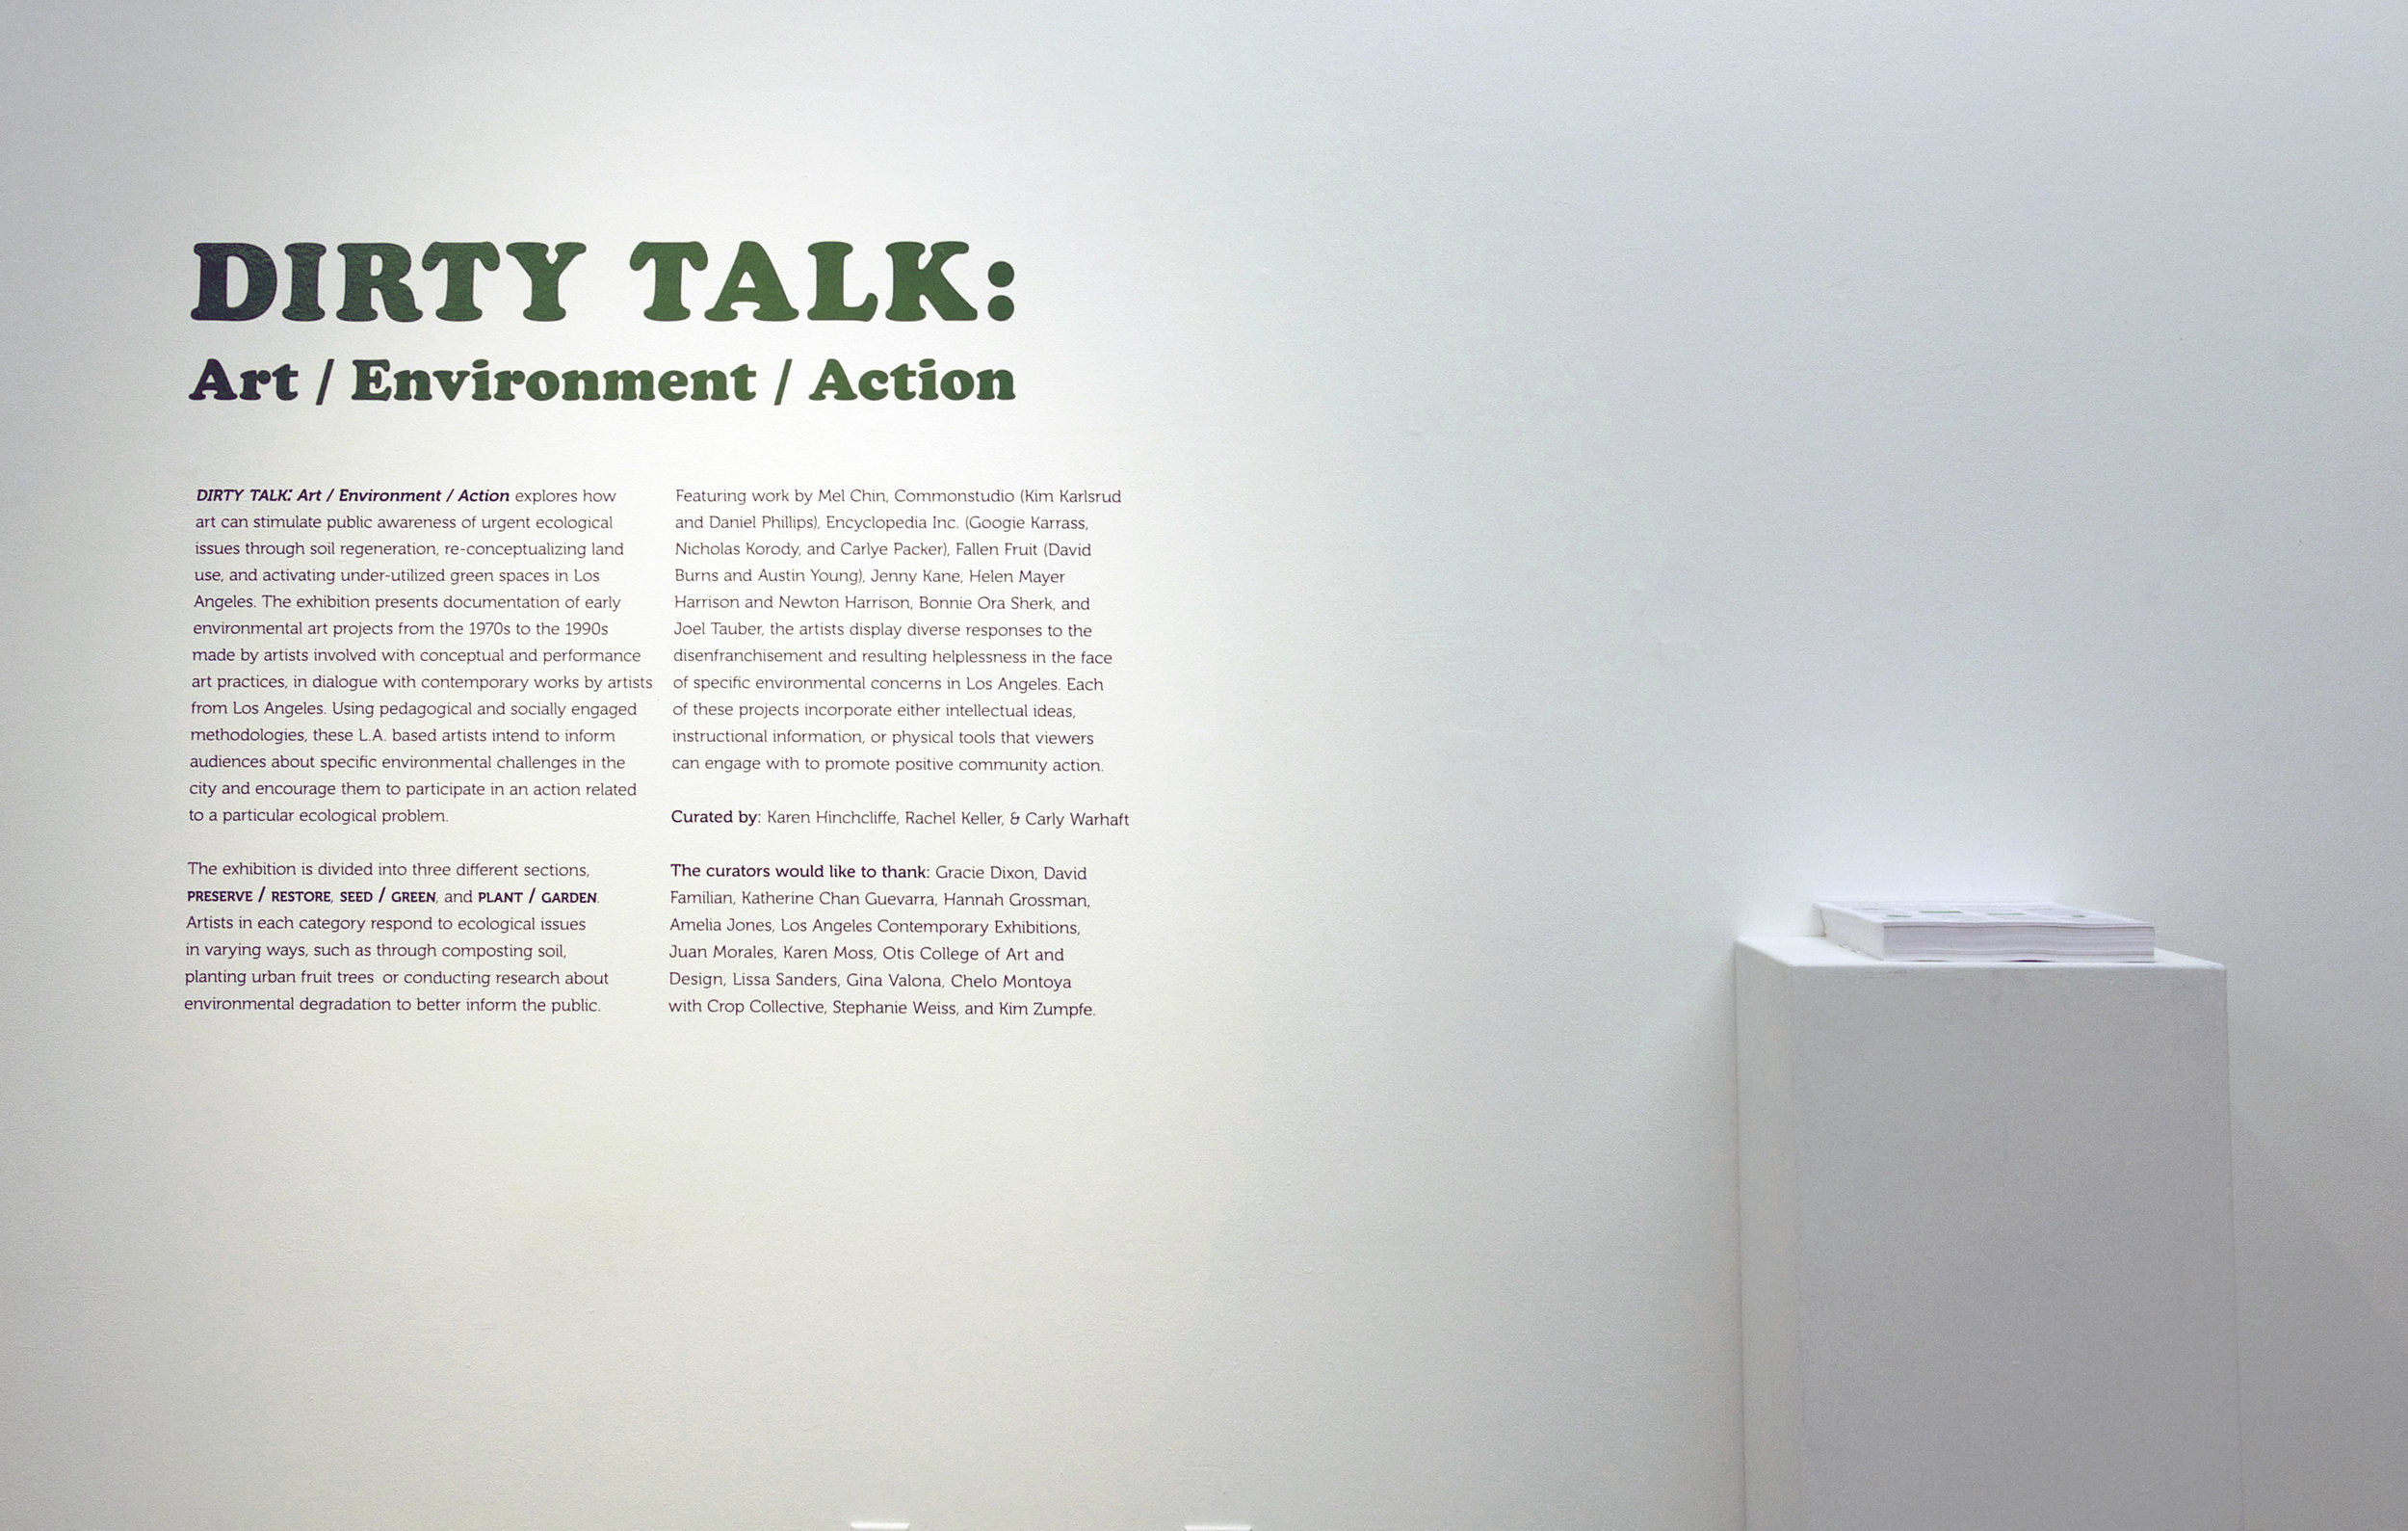 Dirty Talk_Wall Intro Text_LR.jpg